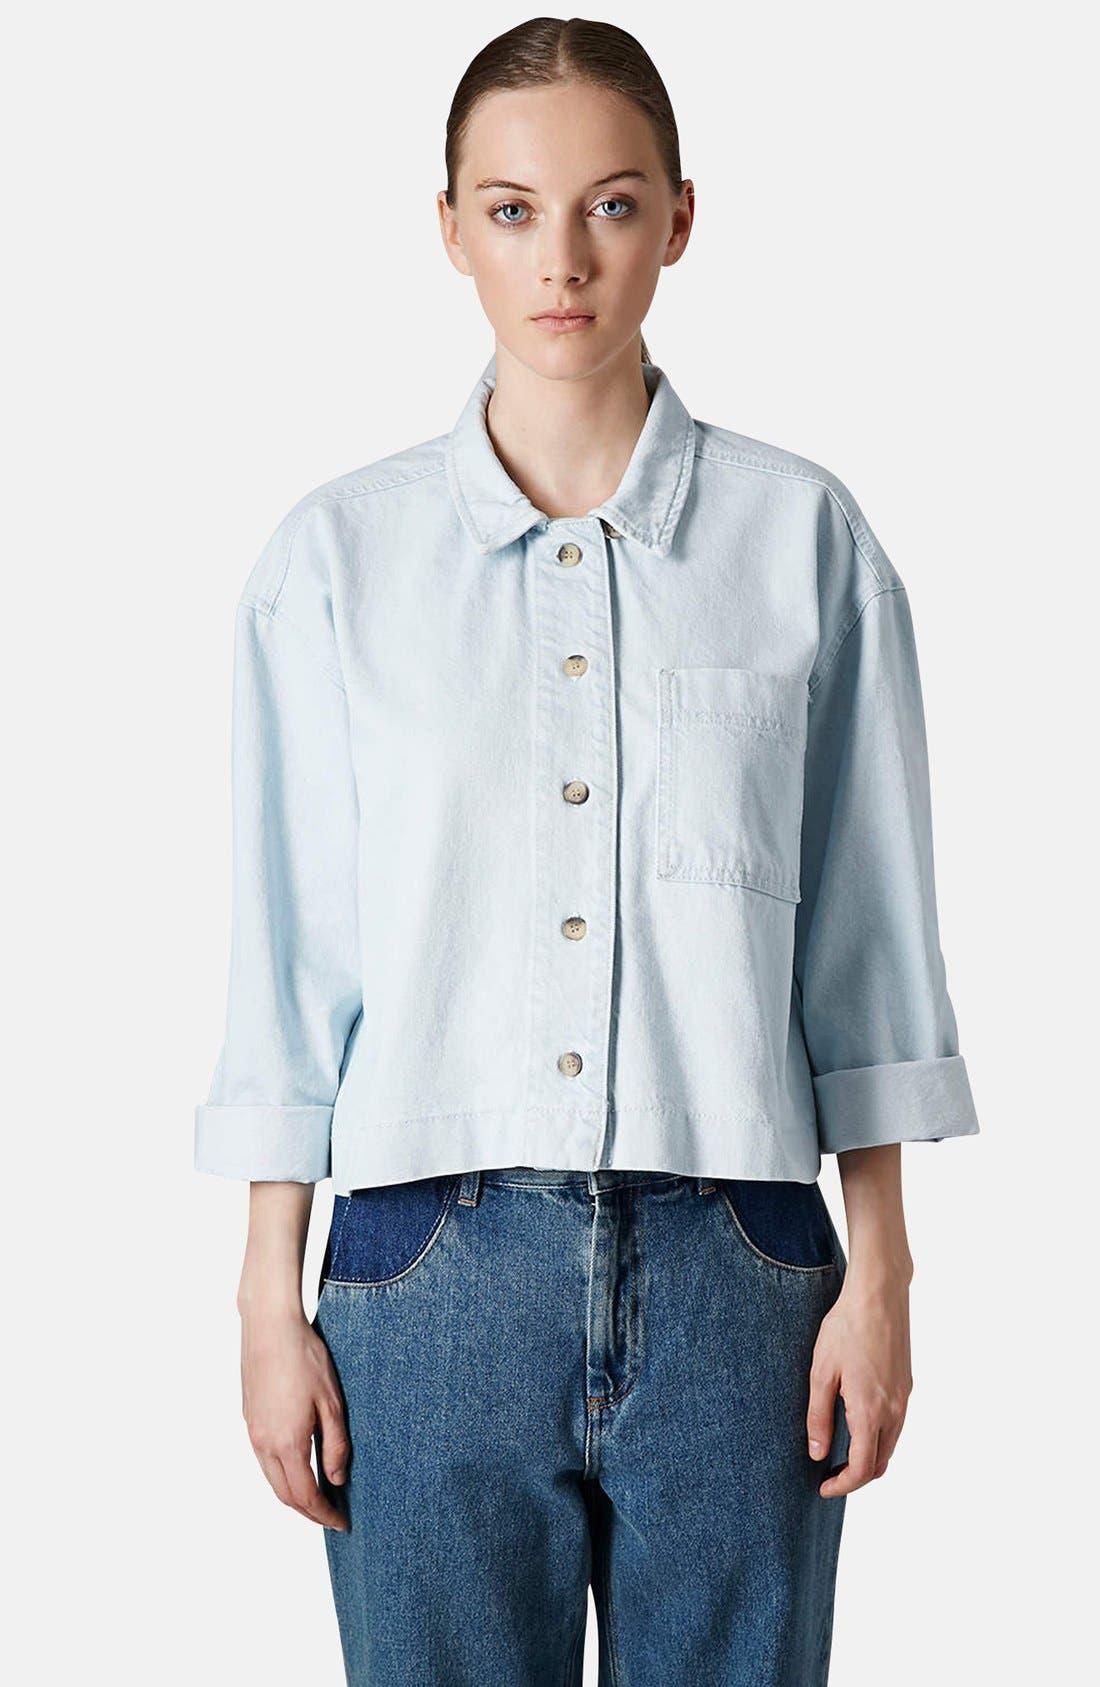 Alternate Image 1 Selected - Topshop Boutique Crop Denim Shirt